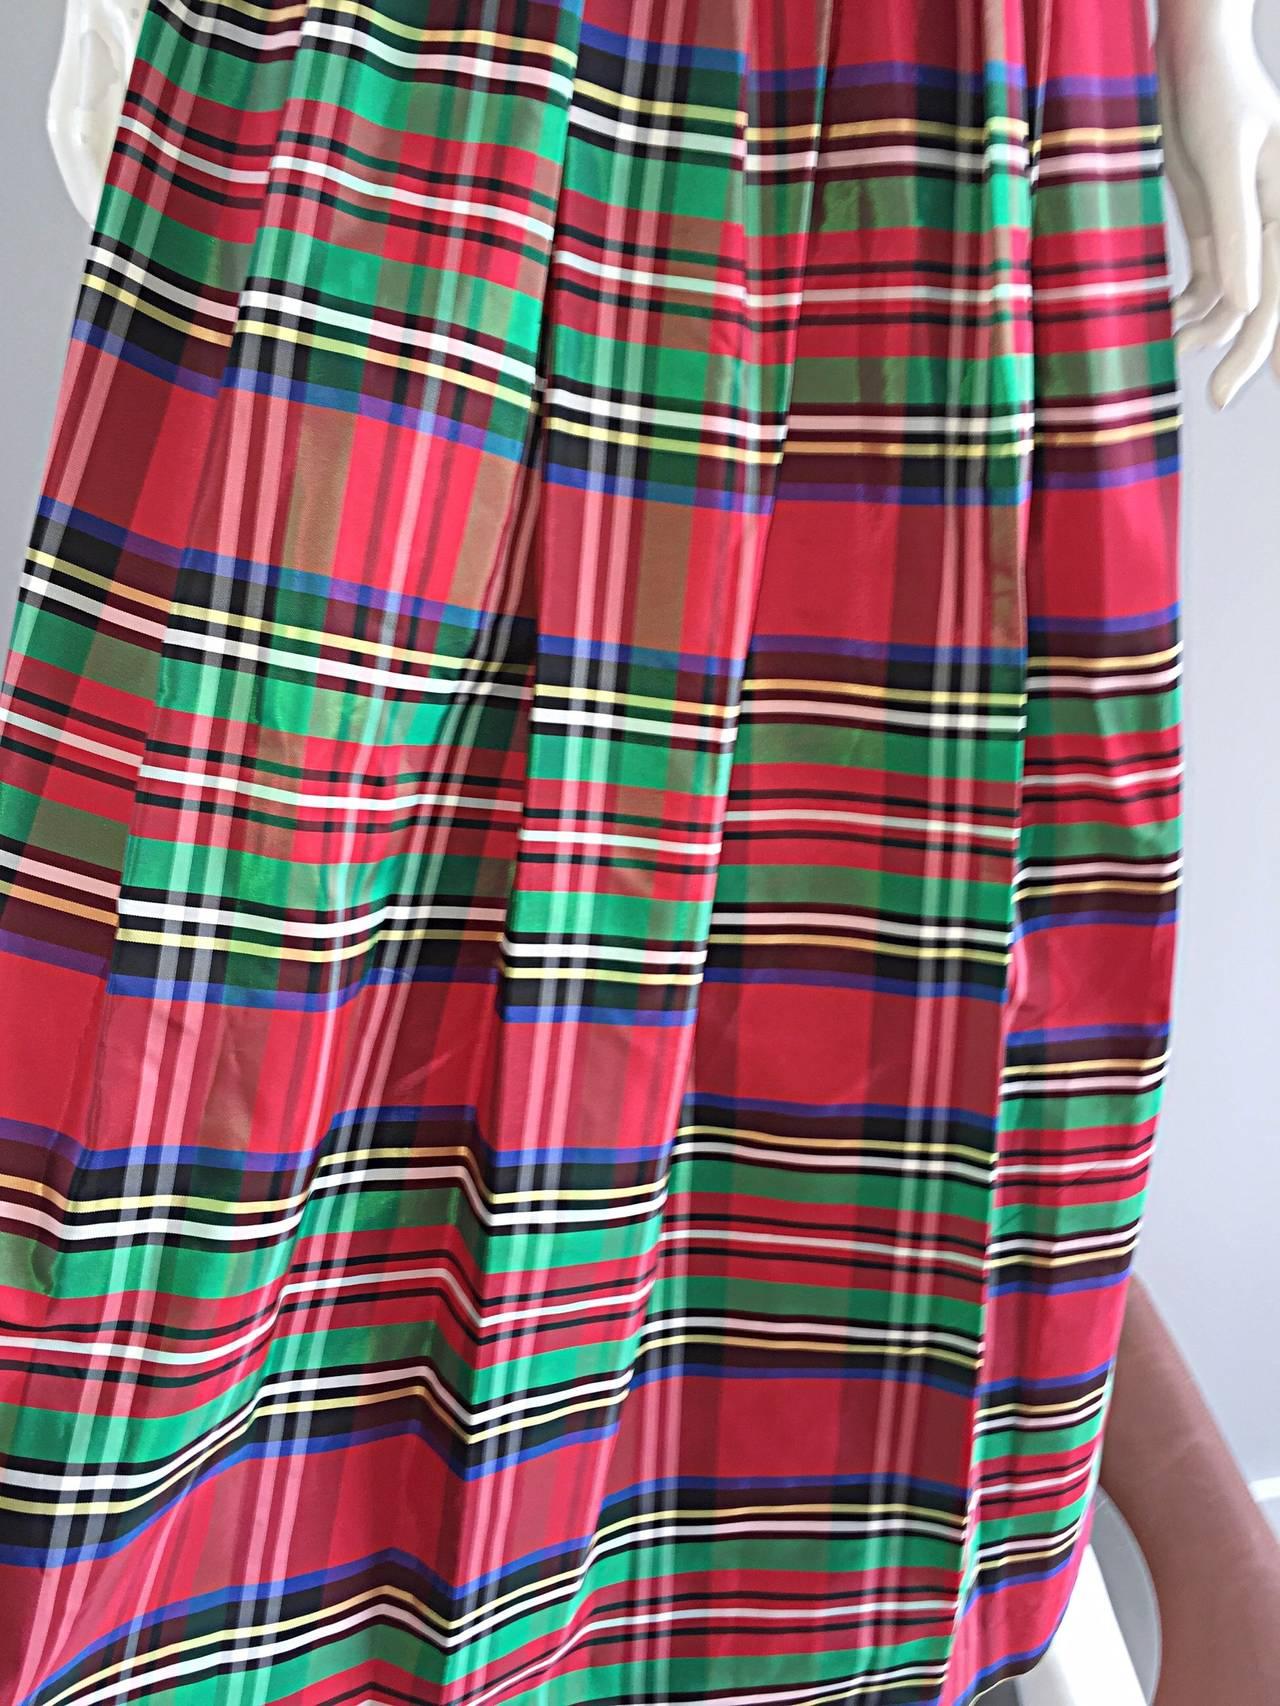 Rare Very Early Vintage Ellen Tracy For Bonwit Teller Silk